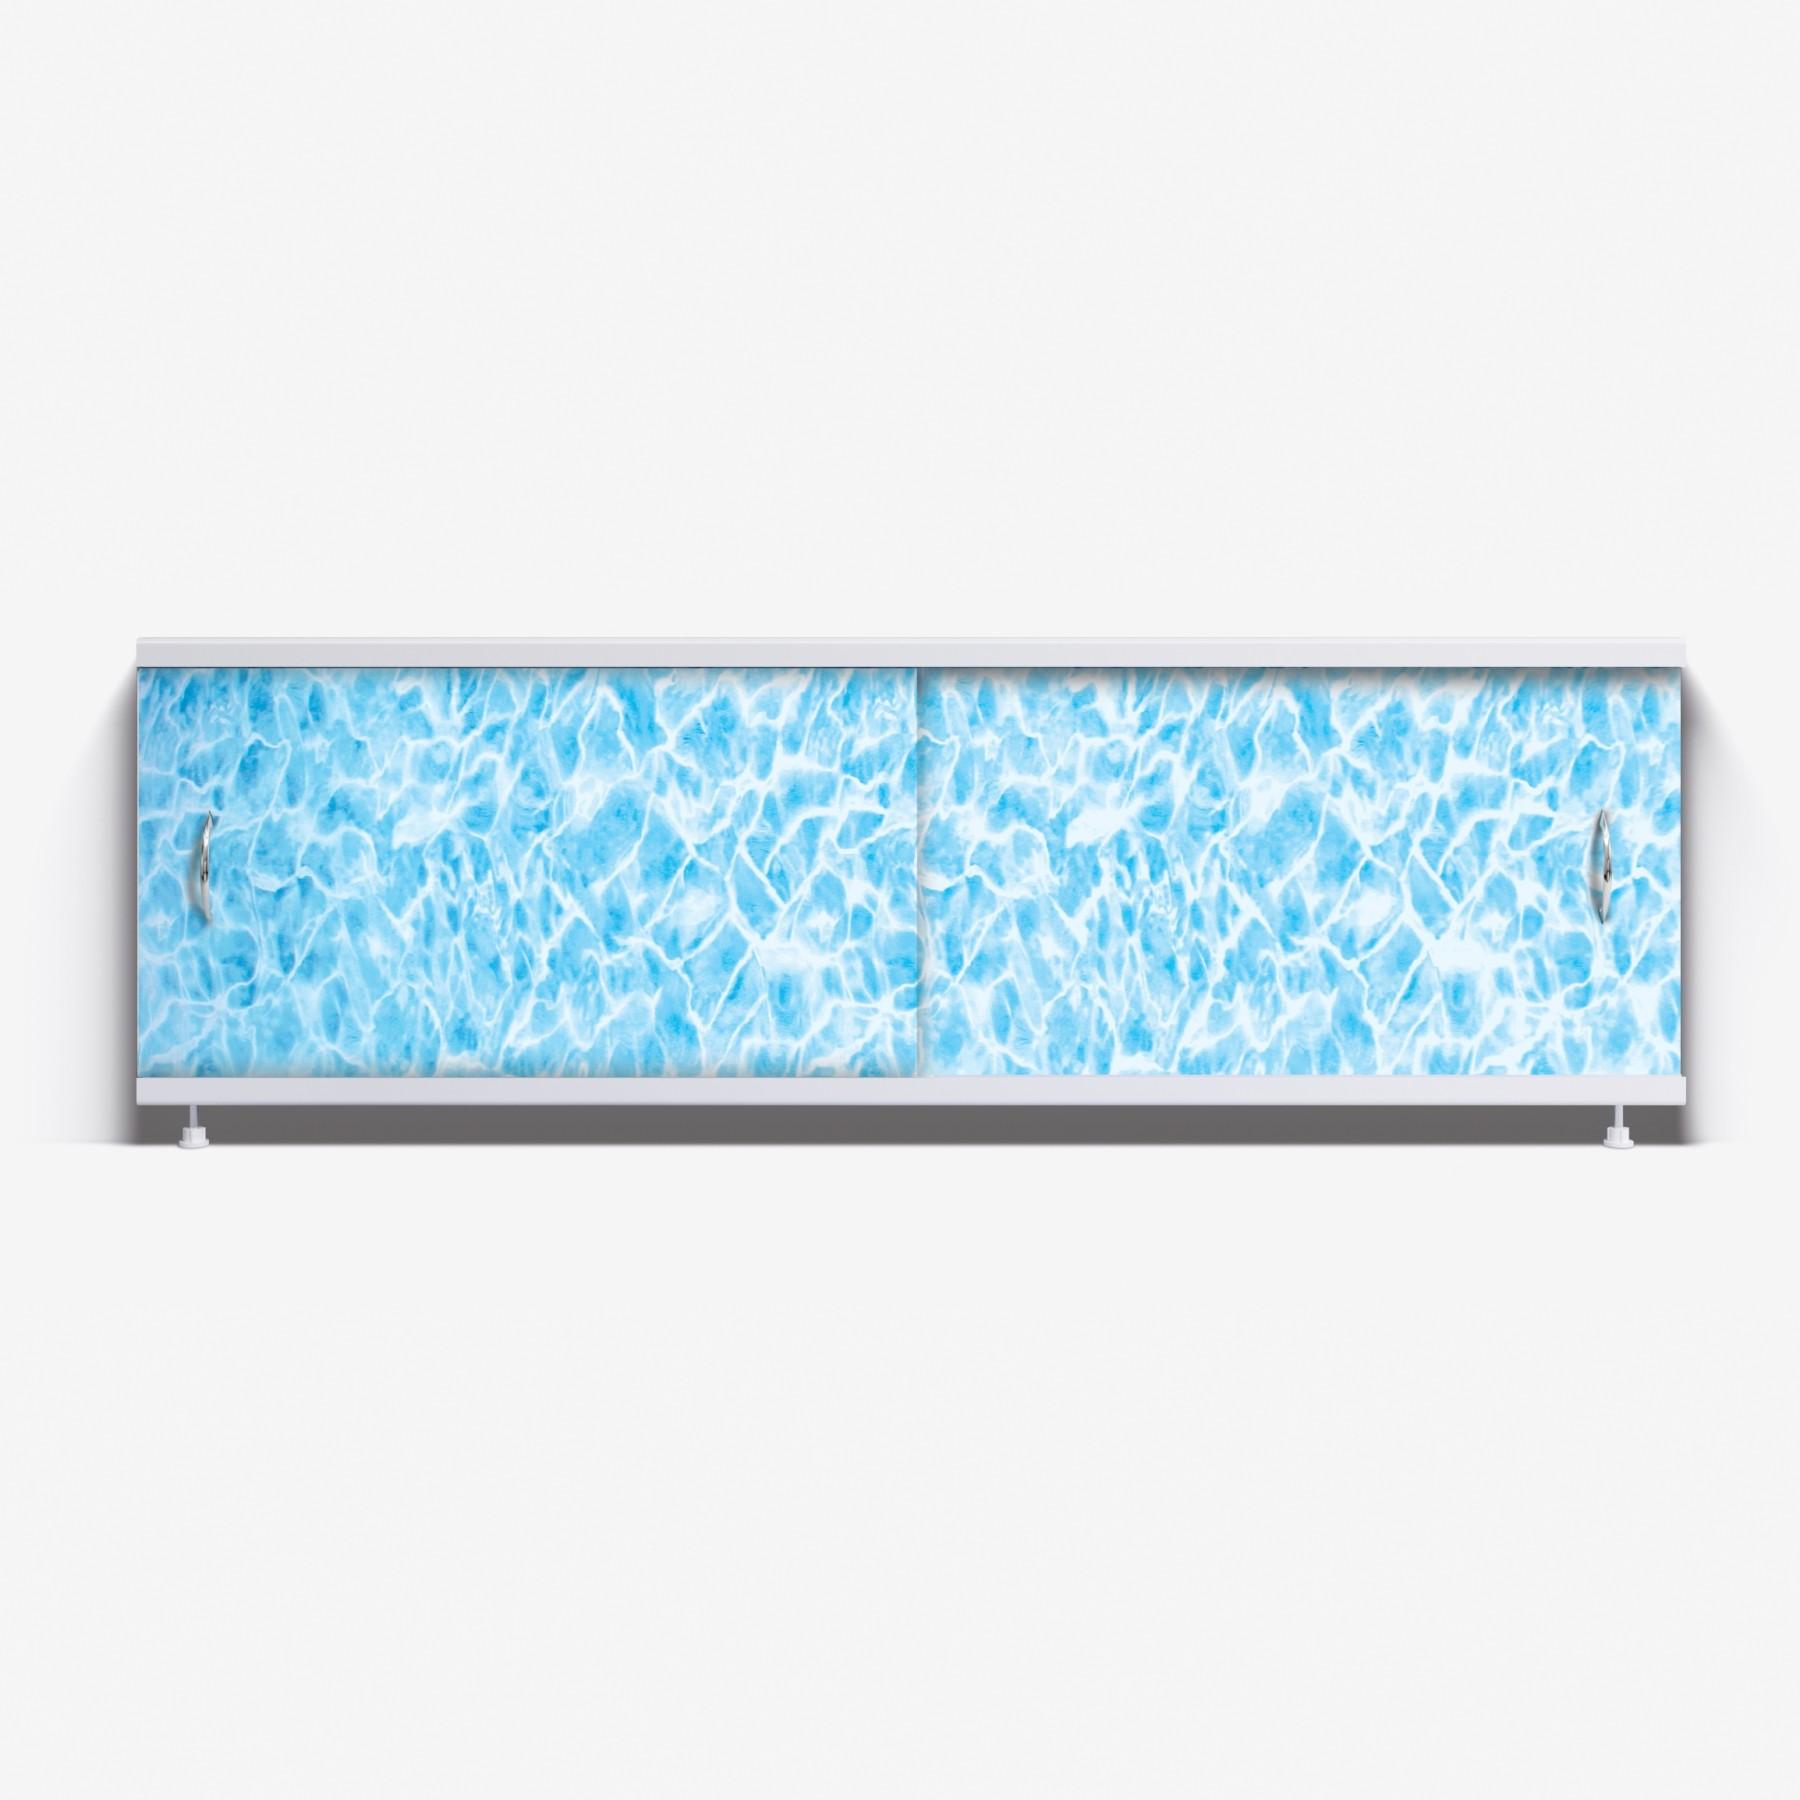 Экран под ванну Классик 150 синий мрамор